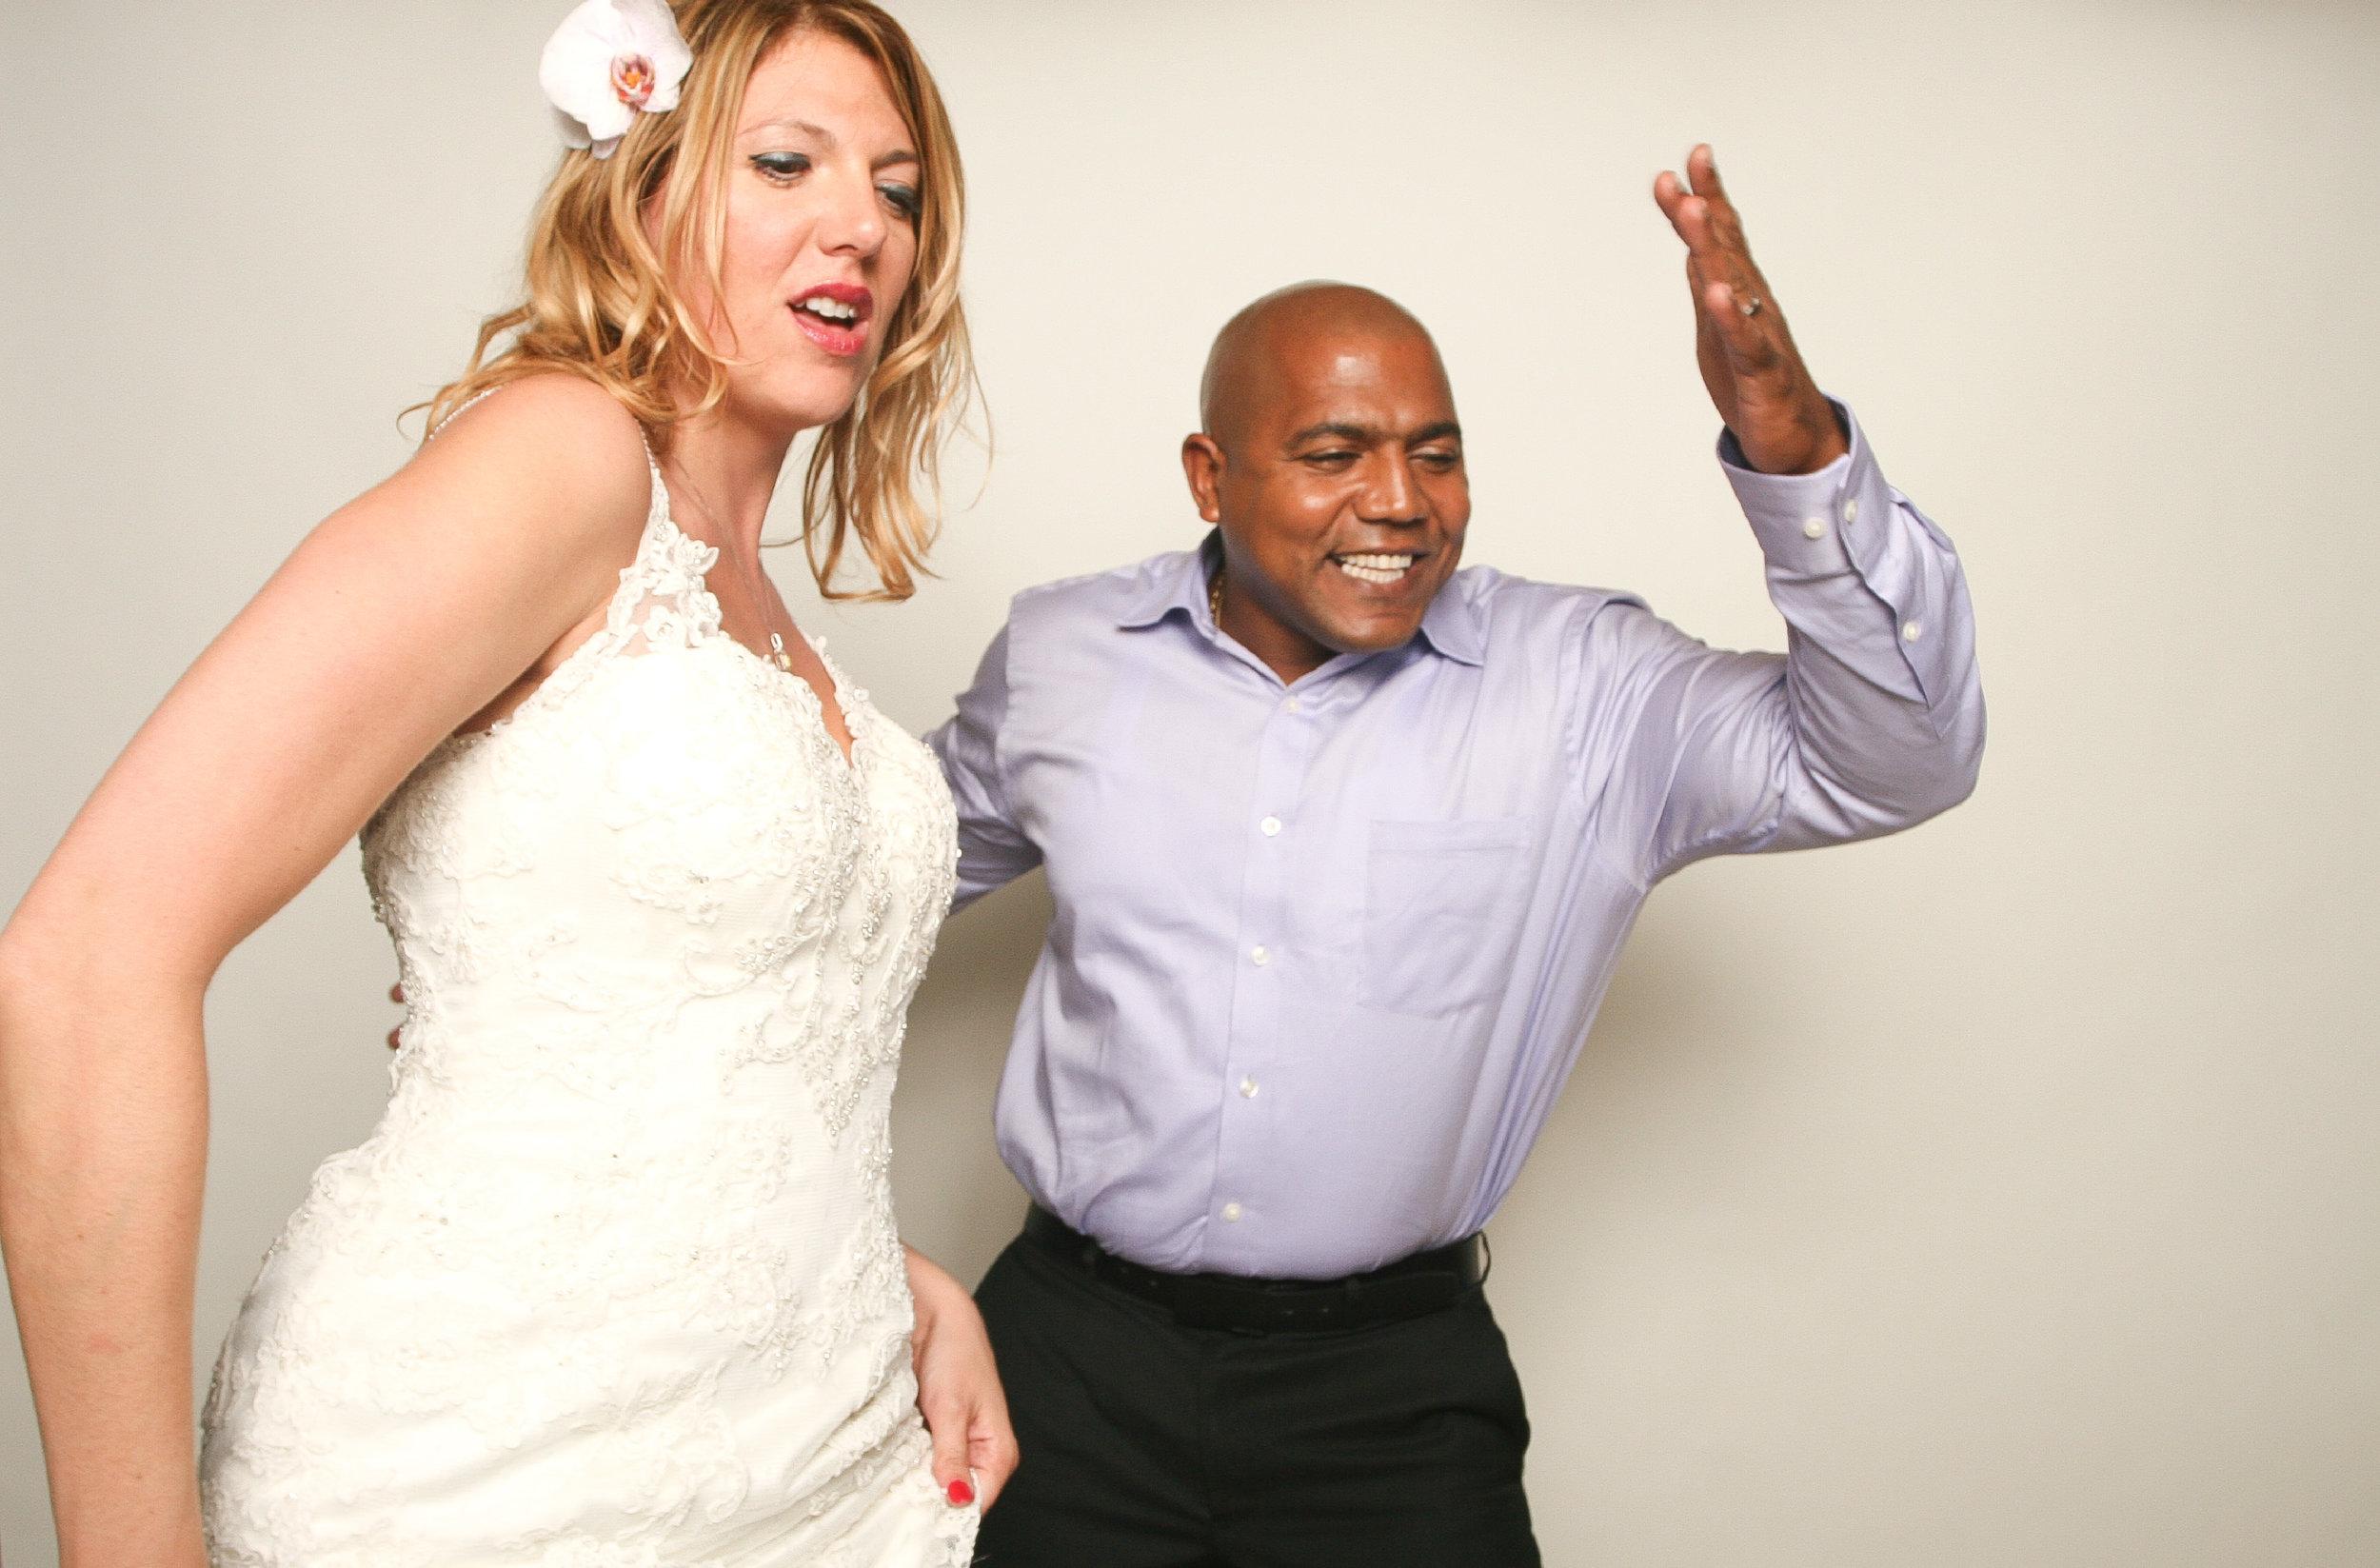 South Florida Miami Wedding Photobooth4.jpg